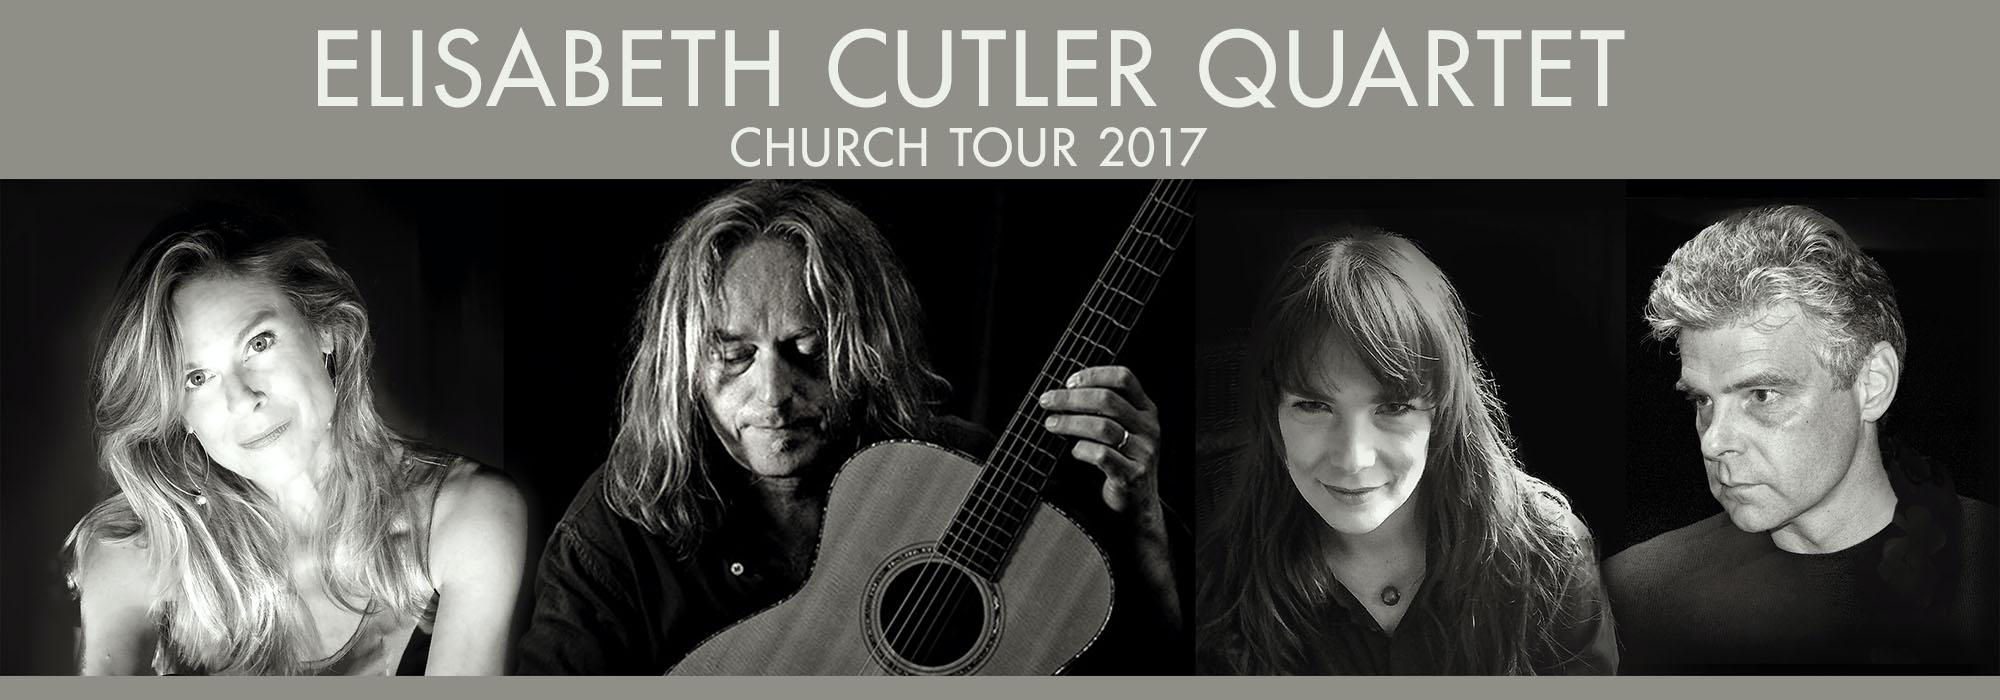 Elisabeth Cutler Quartett live